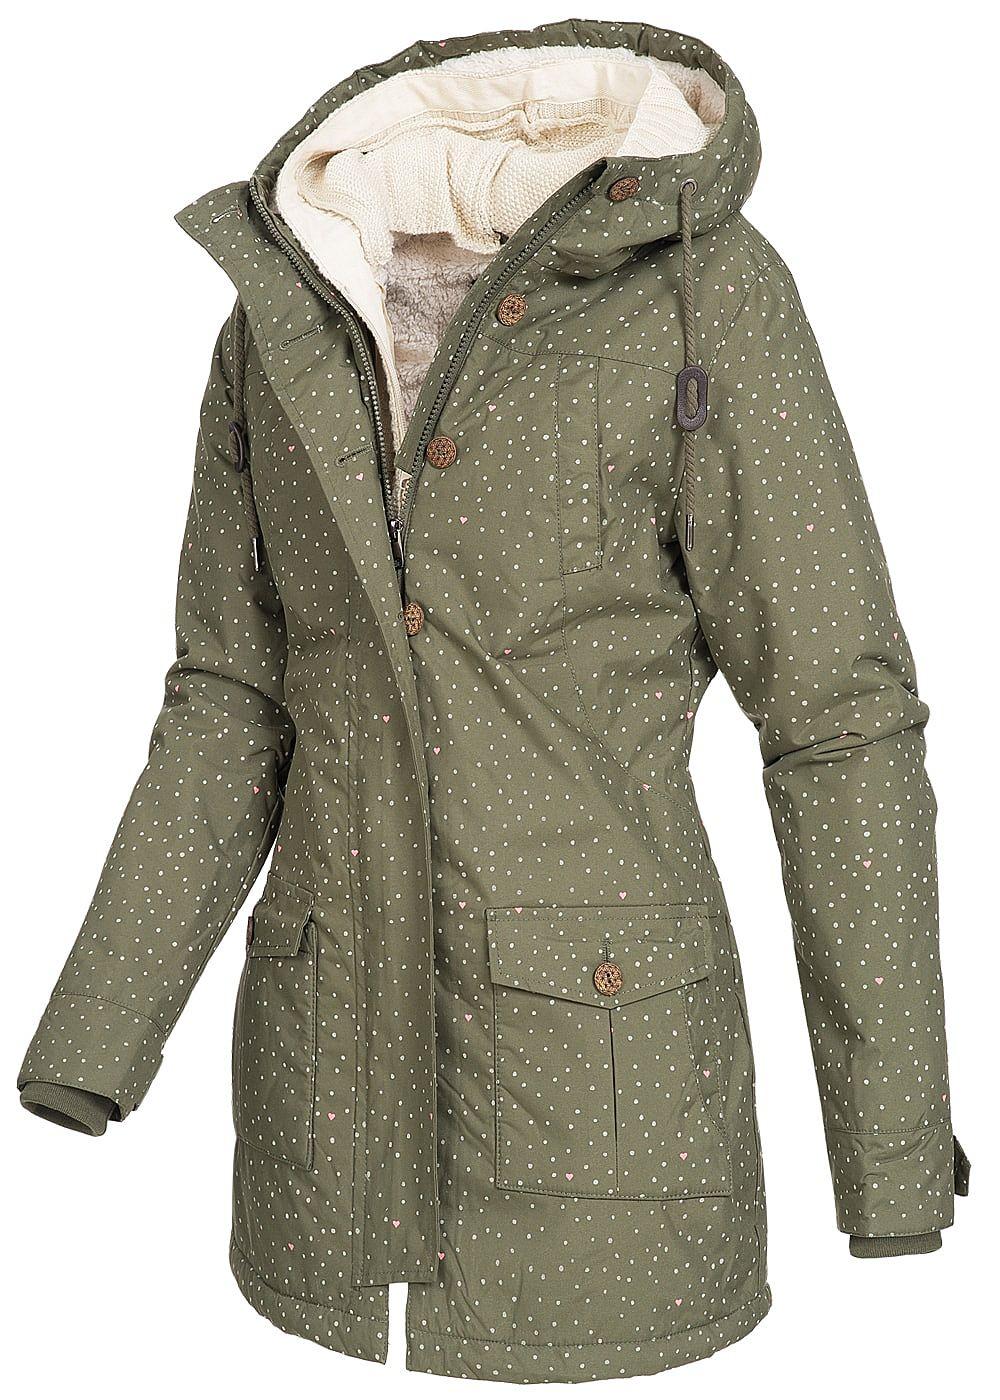 019e29a3e13c76 Seventyseven Damen Winter Jacke Kapuze 2in1 Optik Punkte Muster olive grün